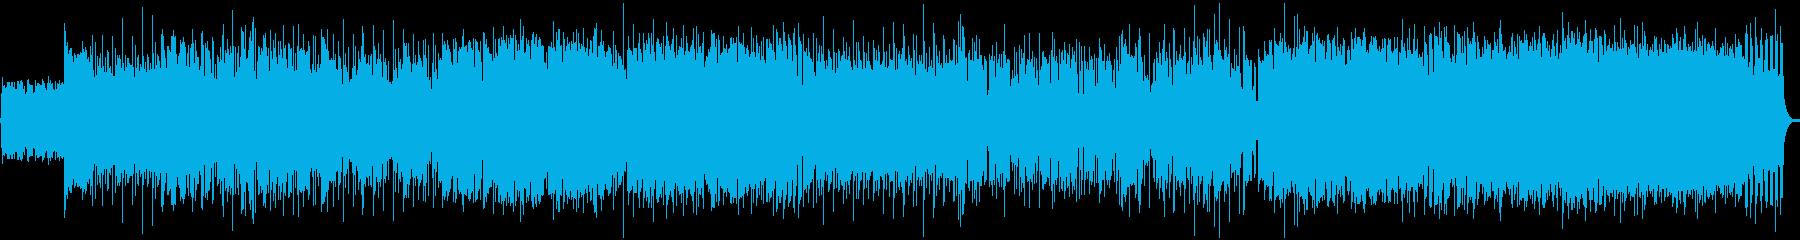 exudate 200Xの再生済みの波形